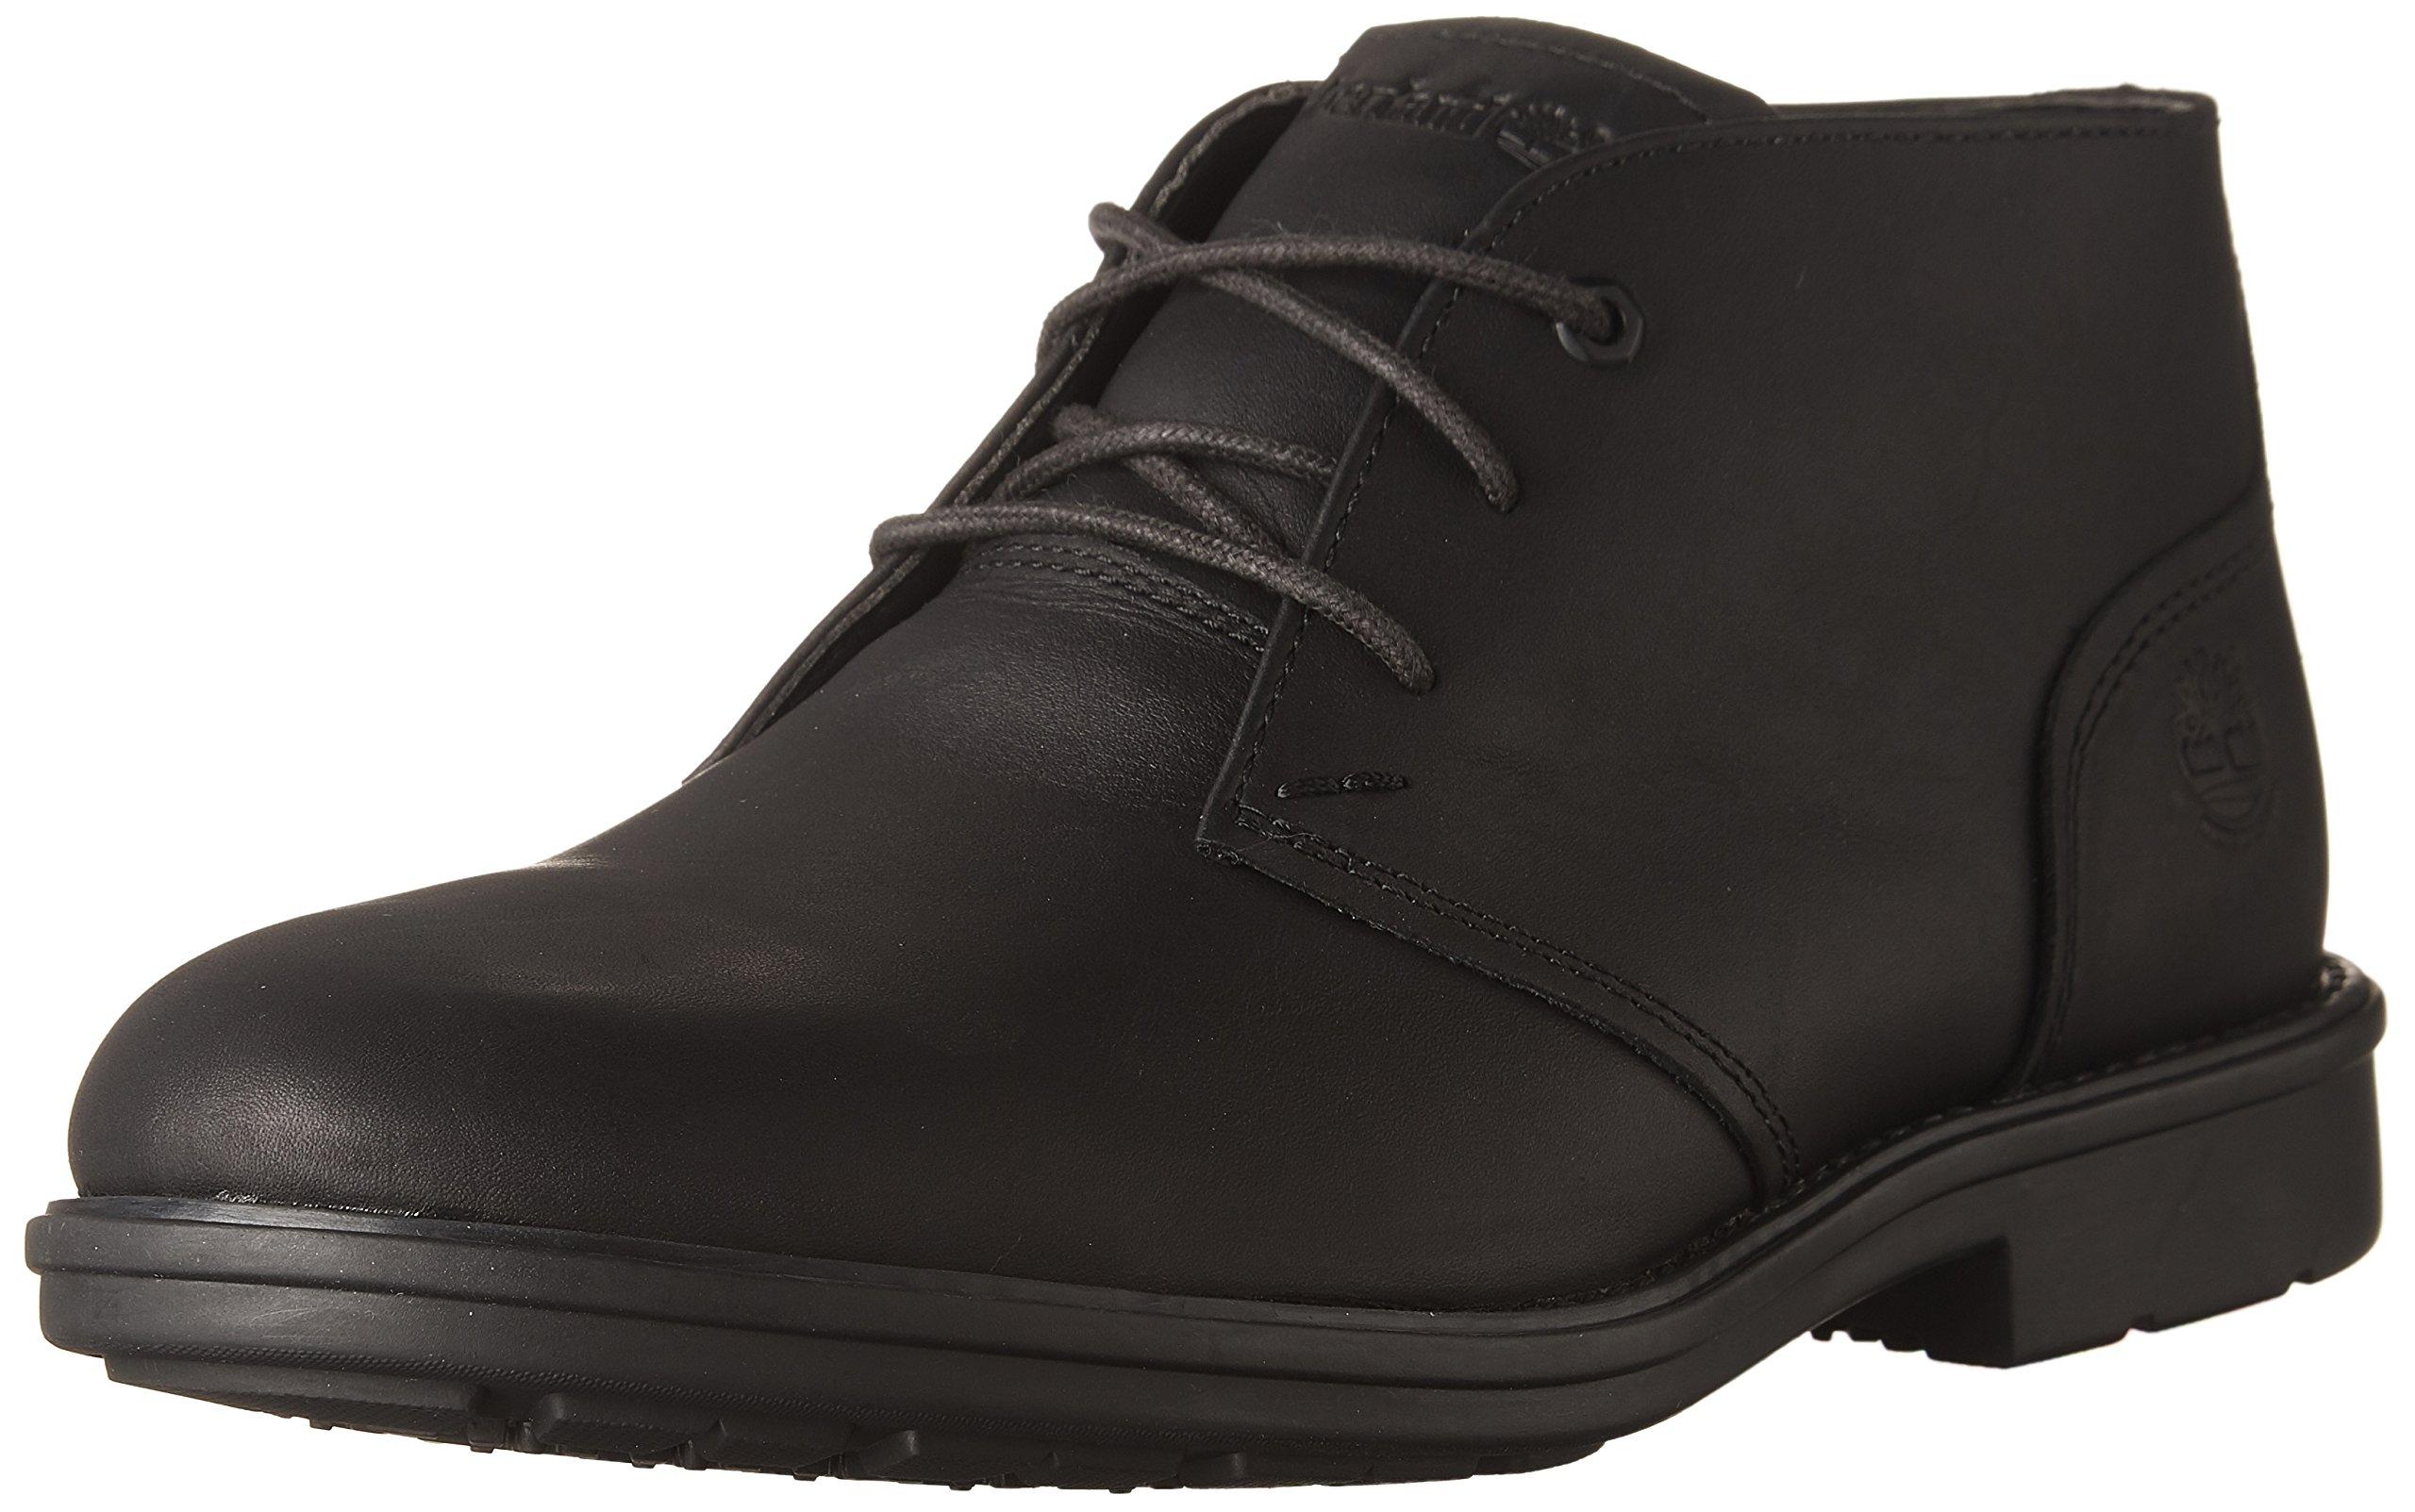 Timberland Men's Carter Notch Waterproof Plain Toe Chukka Black Full Grain Boot 13 D (M)